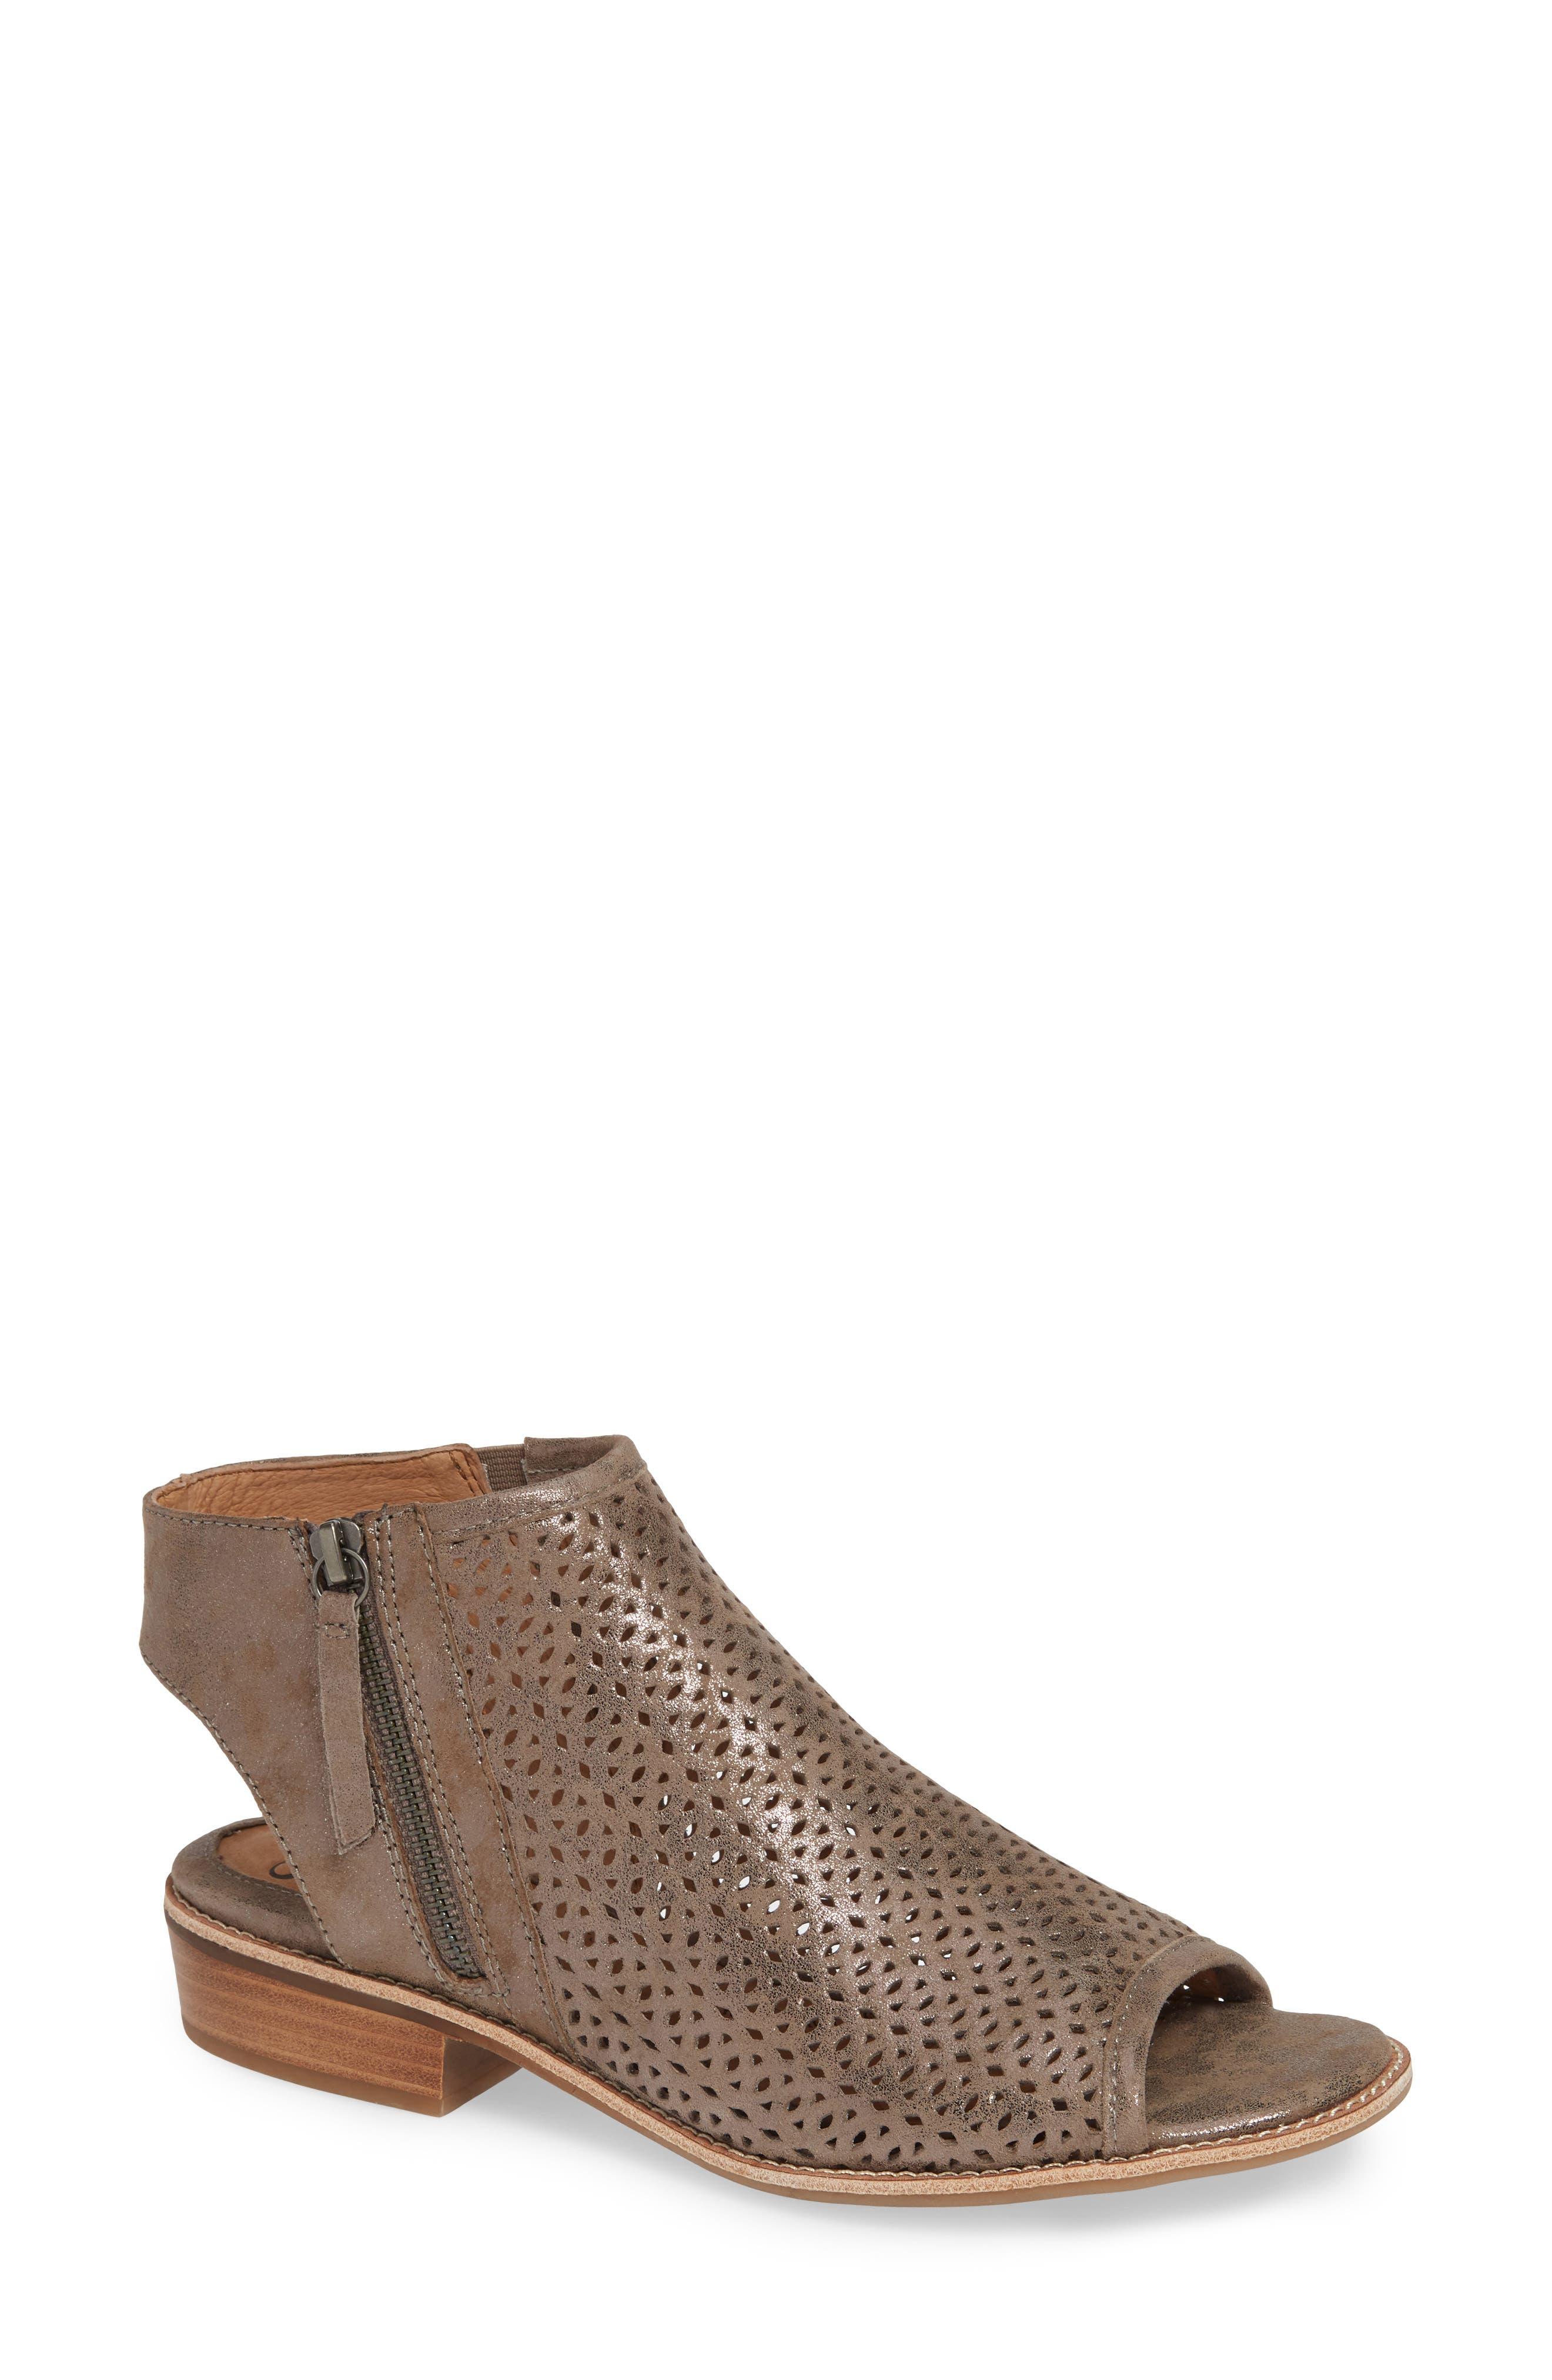 SÖFFT Natesa Perforated Sandal, Main, color, SMOKE SUEDE